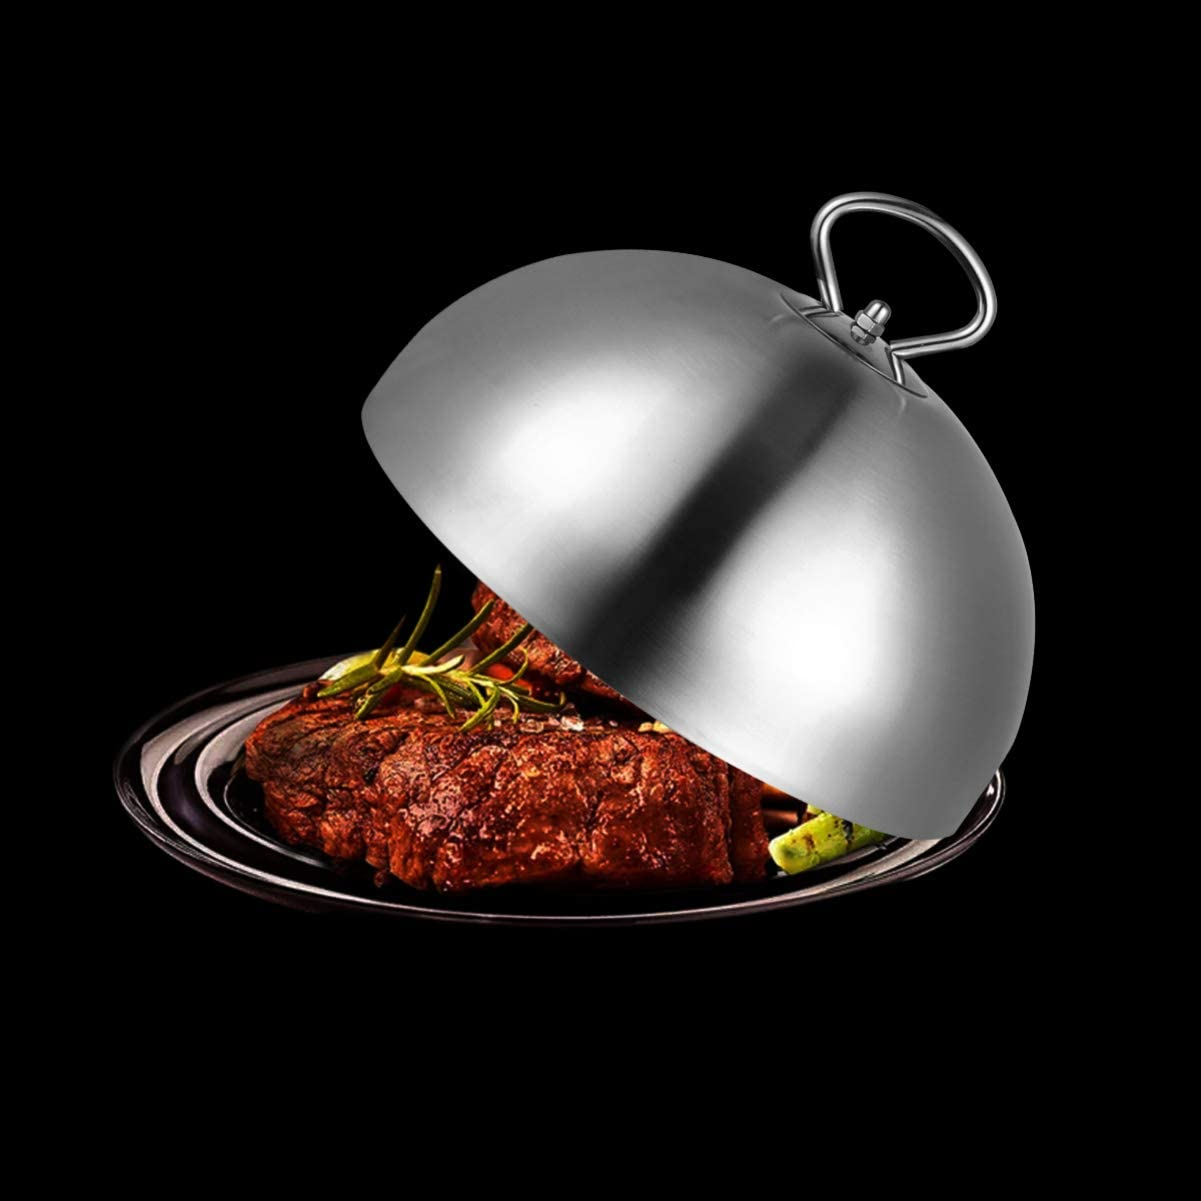 Cabilock Edelstahl Speiseglocke Tellerglocke 24cm Topfdeckel Topf Teppanyaki Deckel Steak Abdeckhaube Burgerhaube Schmelzkuppel Fliegenhaube K/äse Haube f/ür Cheesburger Hamburger Glocke